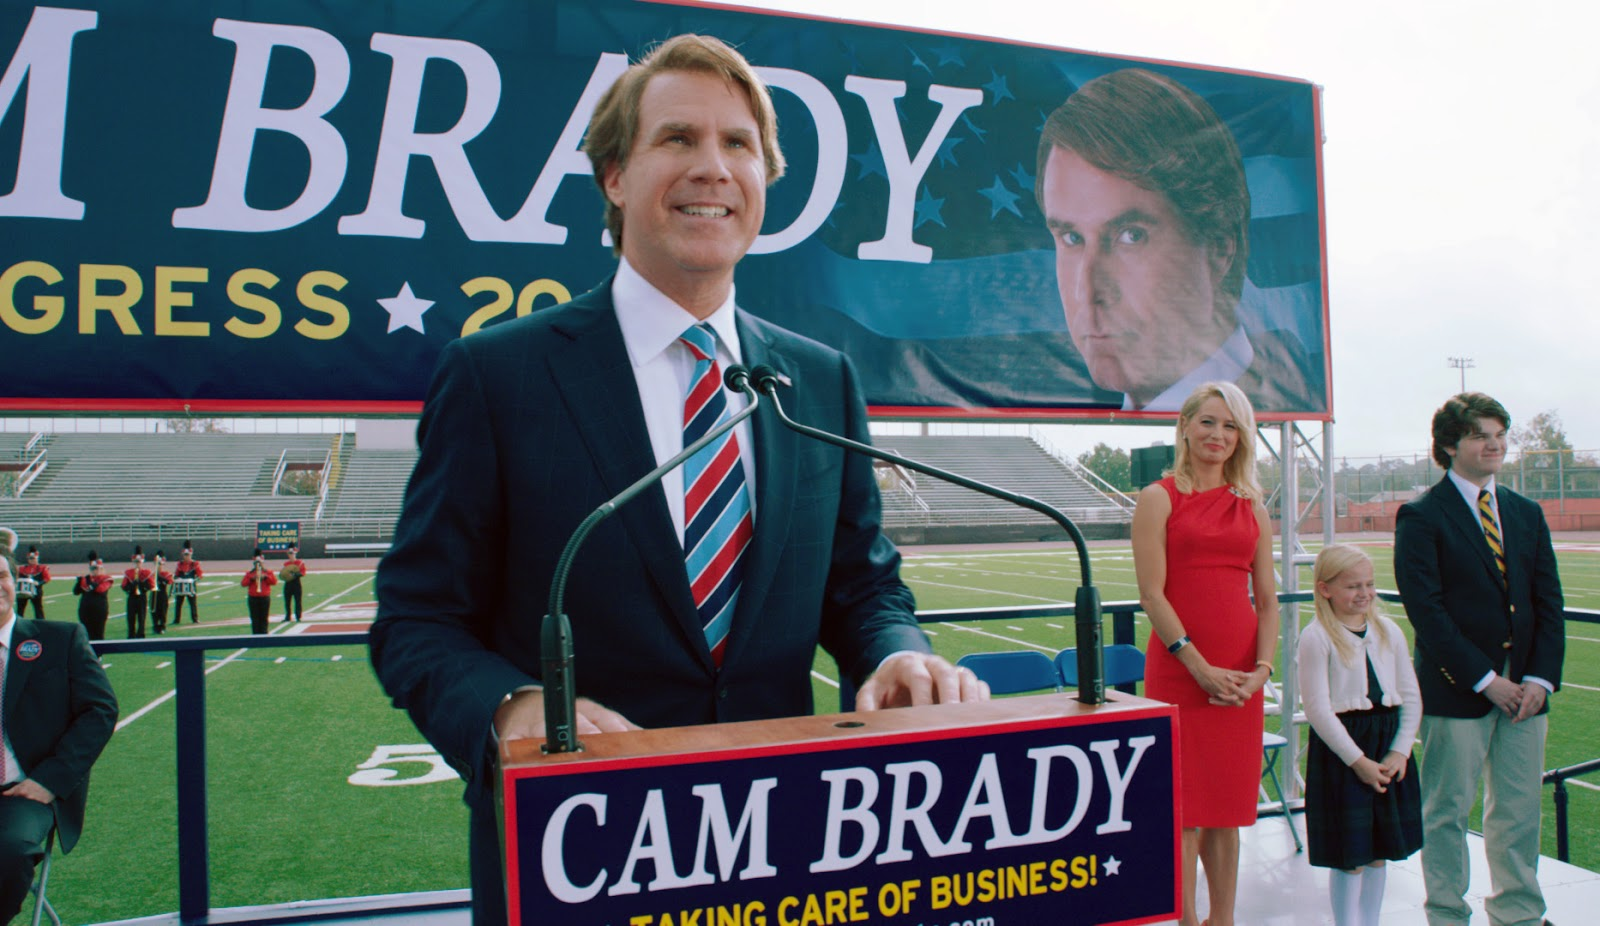 Campaign Cam Brady Quotes. QuotesGram